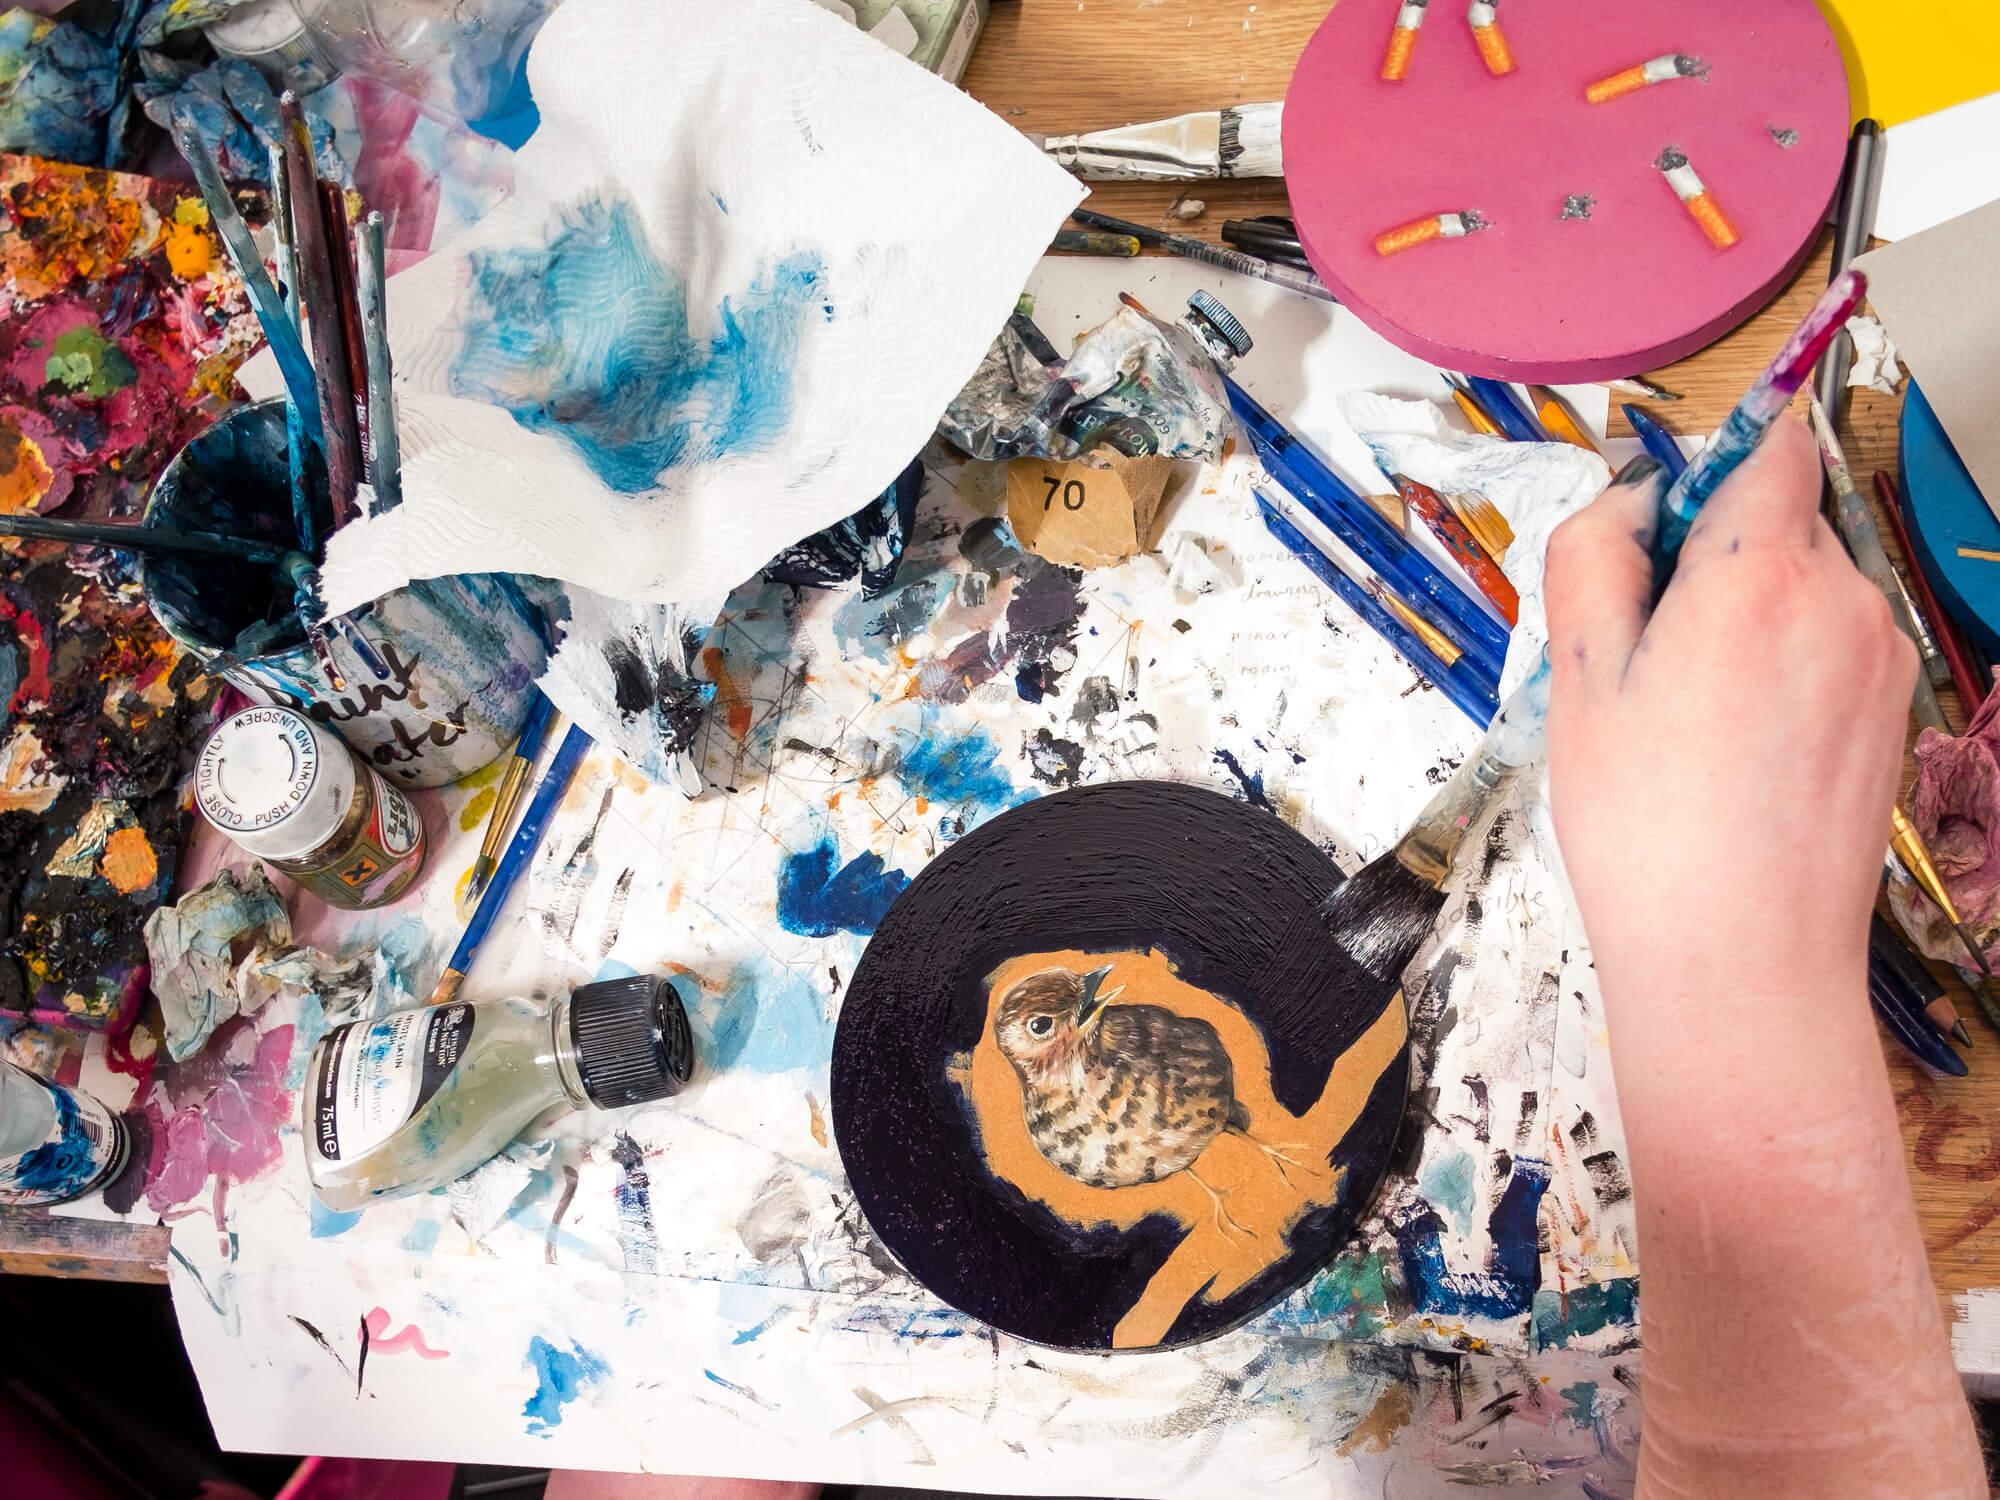 Fine Art student painting